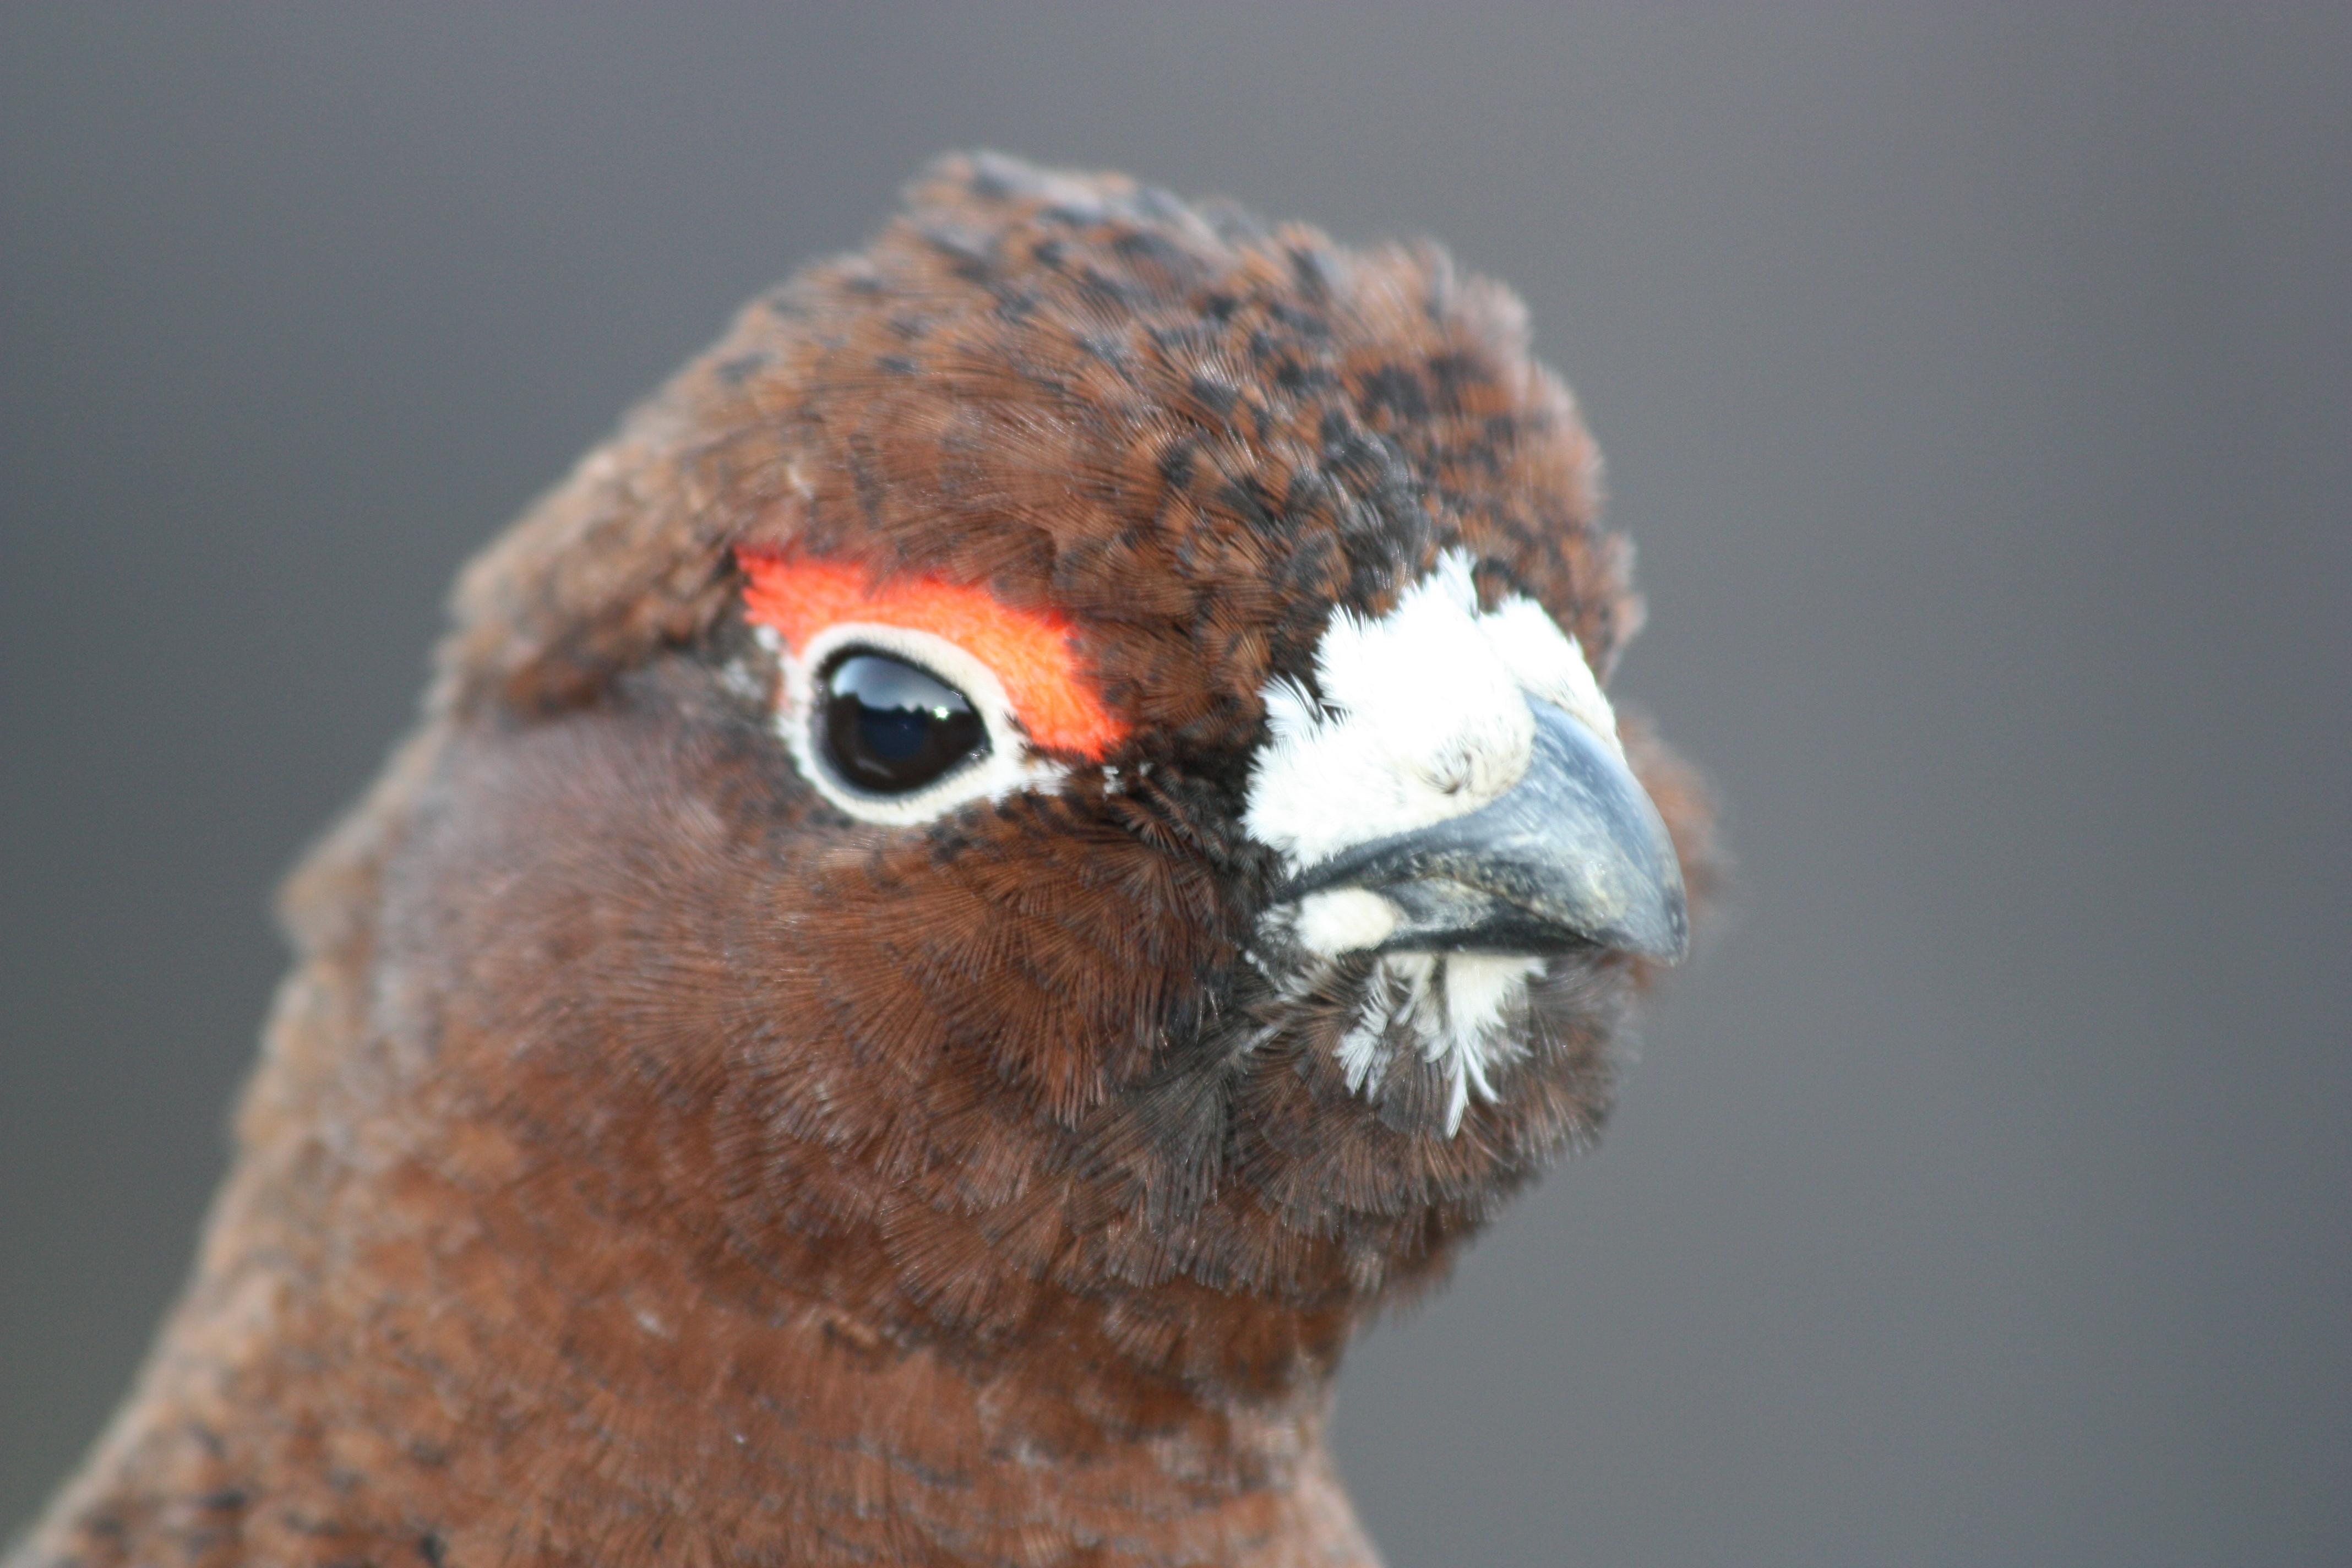 Close view of bird's profile